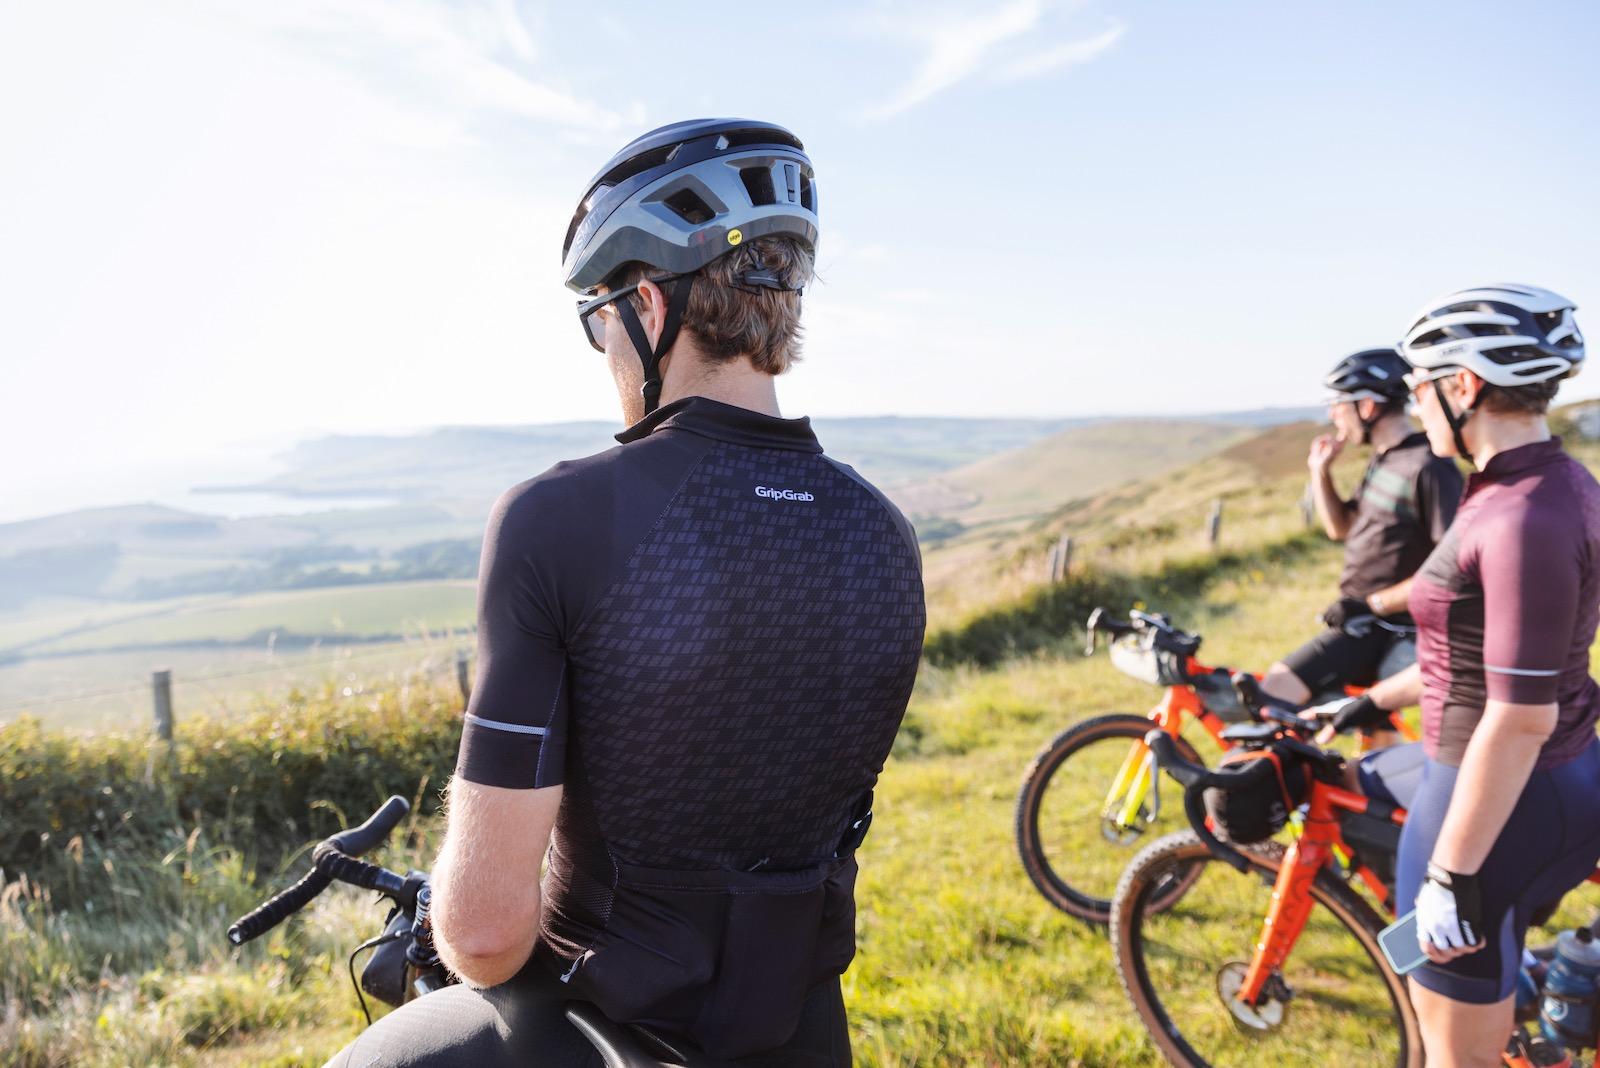 Smith Persist Helmet Review